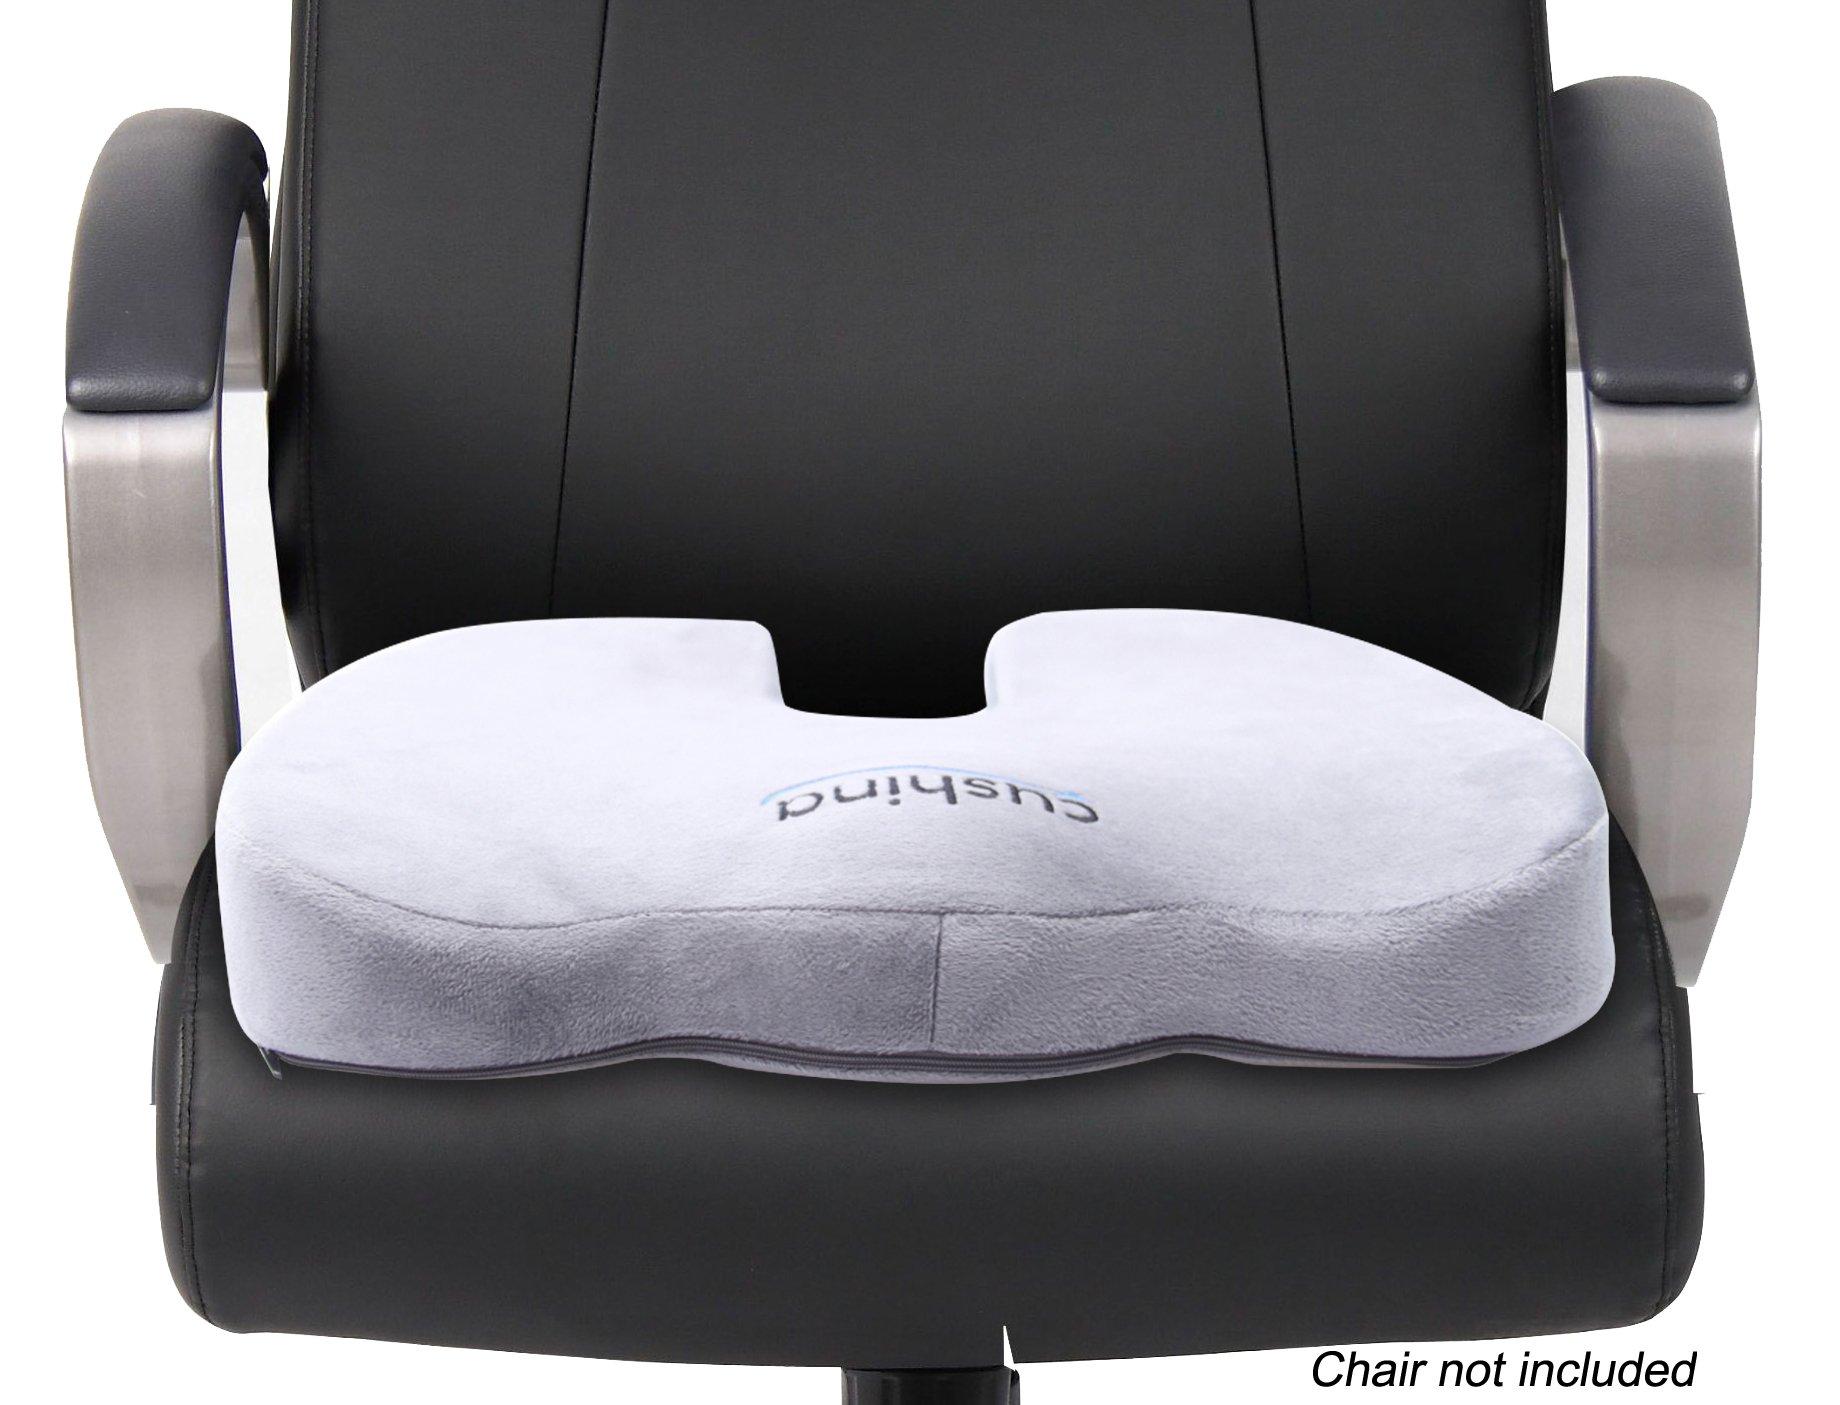 ergonomic chair cushion round lounge chairs for bedroom cushina memory foam seat premium orthopedic